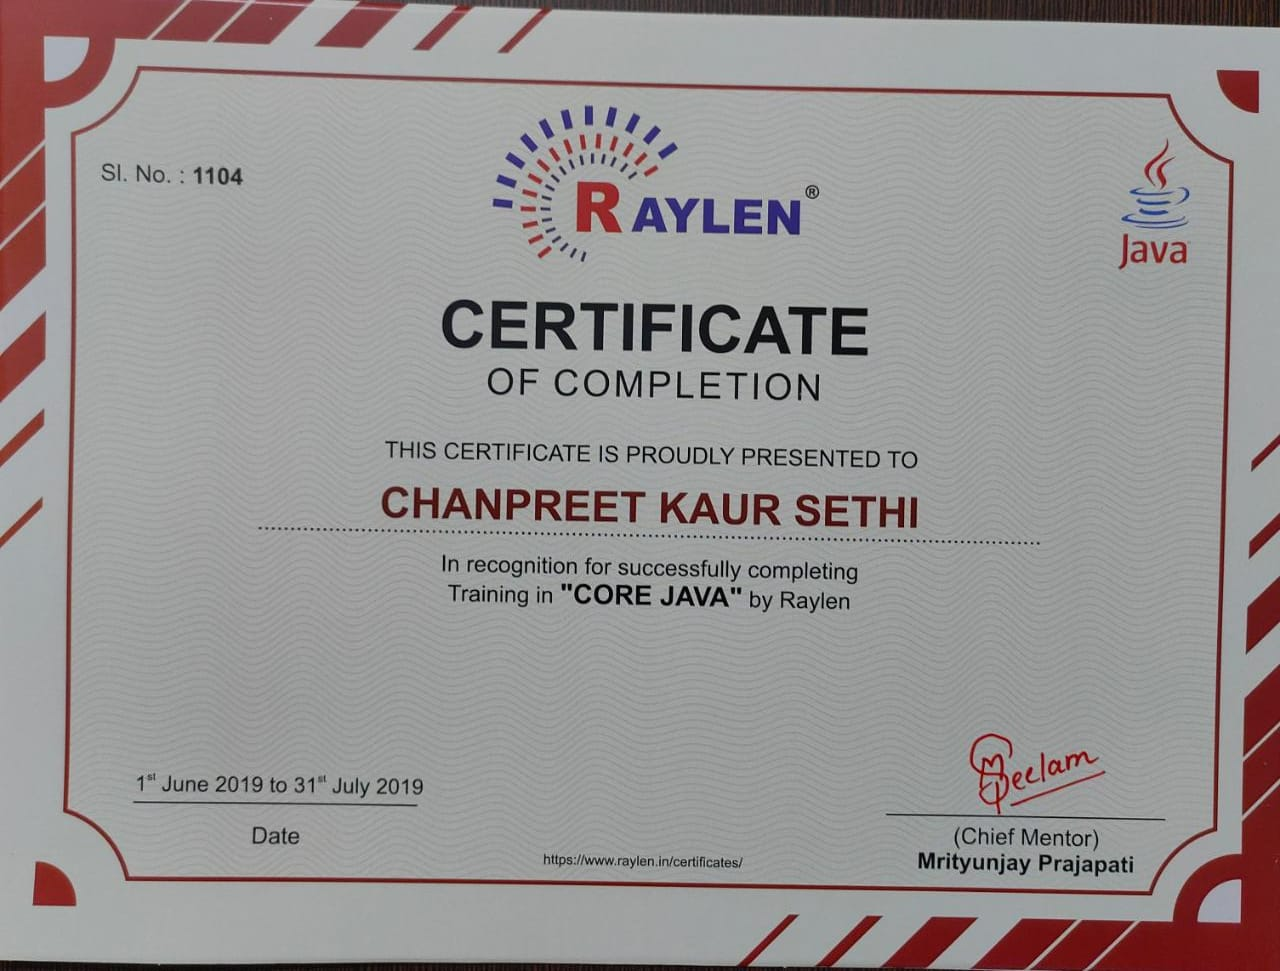 https://www.raylen.in/wp-content/uploads/2019/10/java-certificate-chanpreet-kaur-sethi-1104.jpg